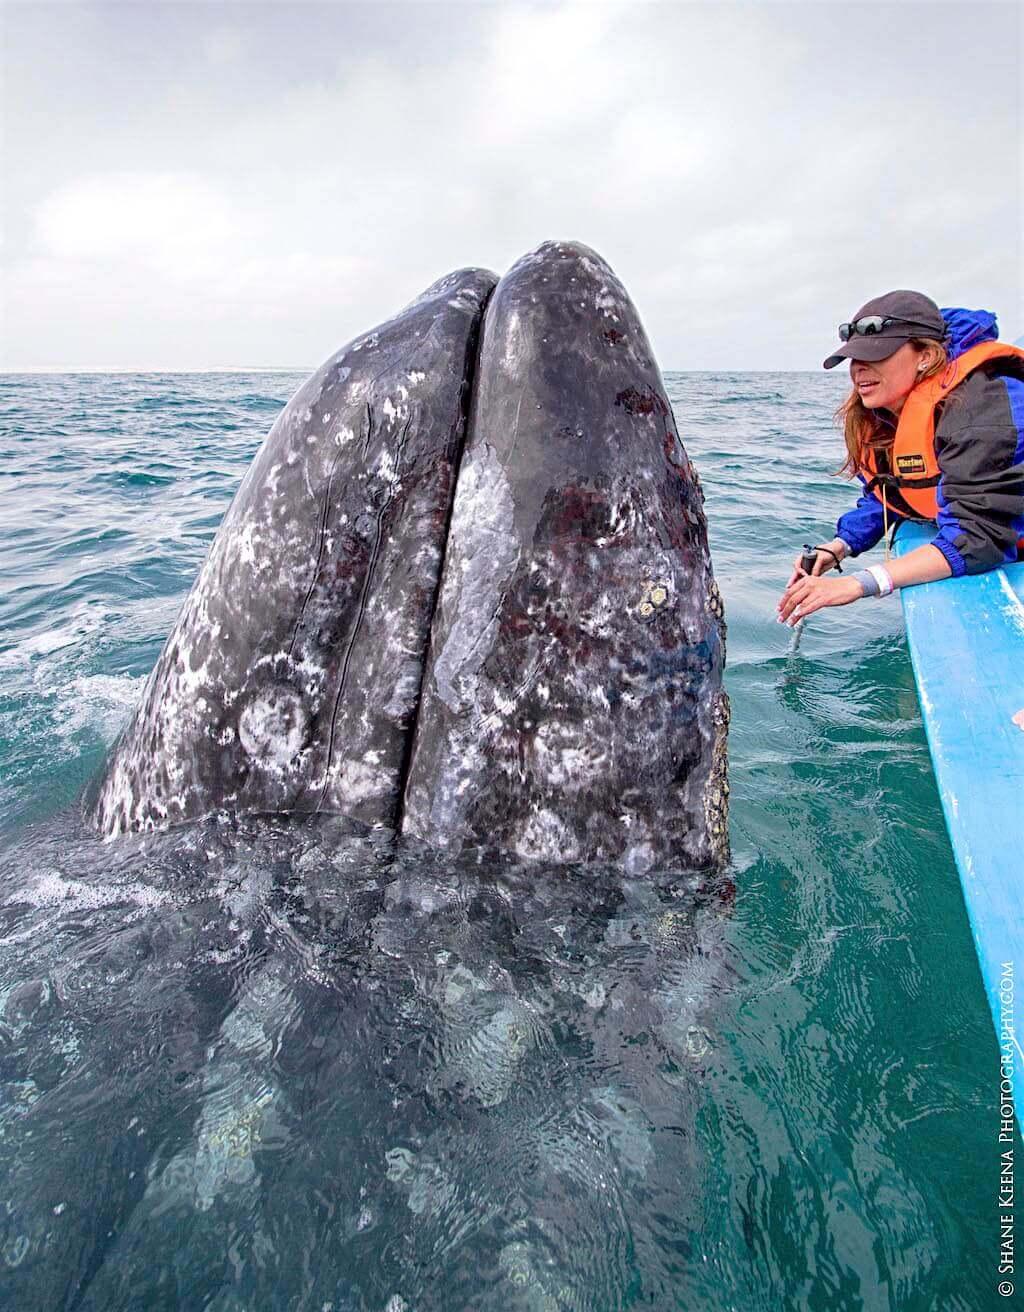 Mastroviaggiatore-Messico-BajaCalifornia-balena-2